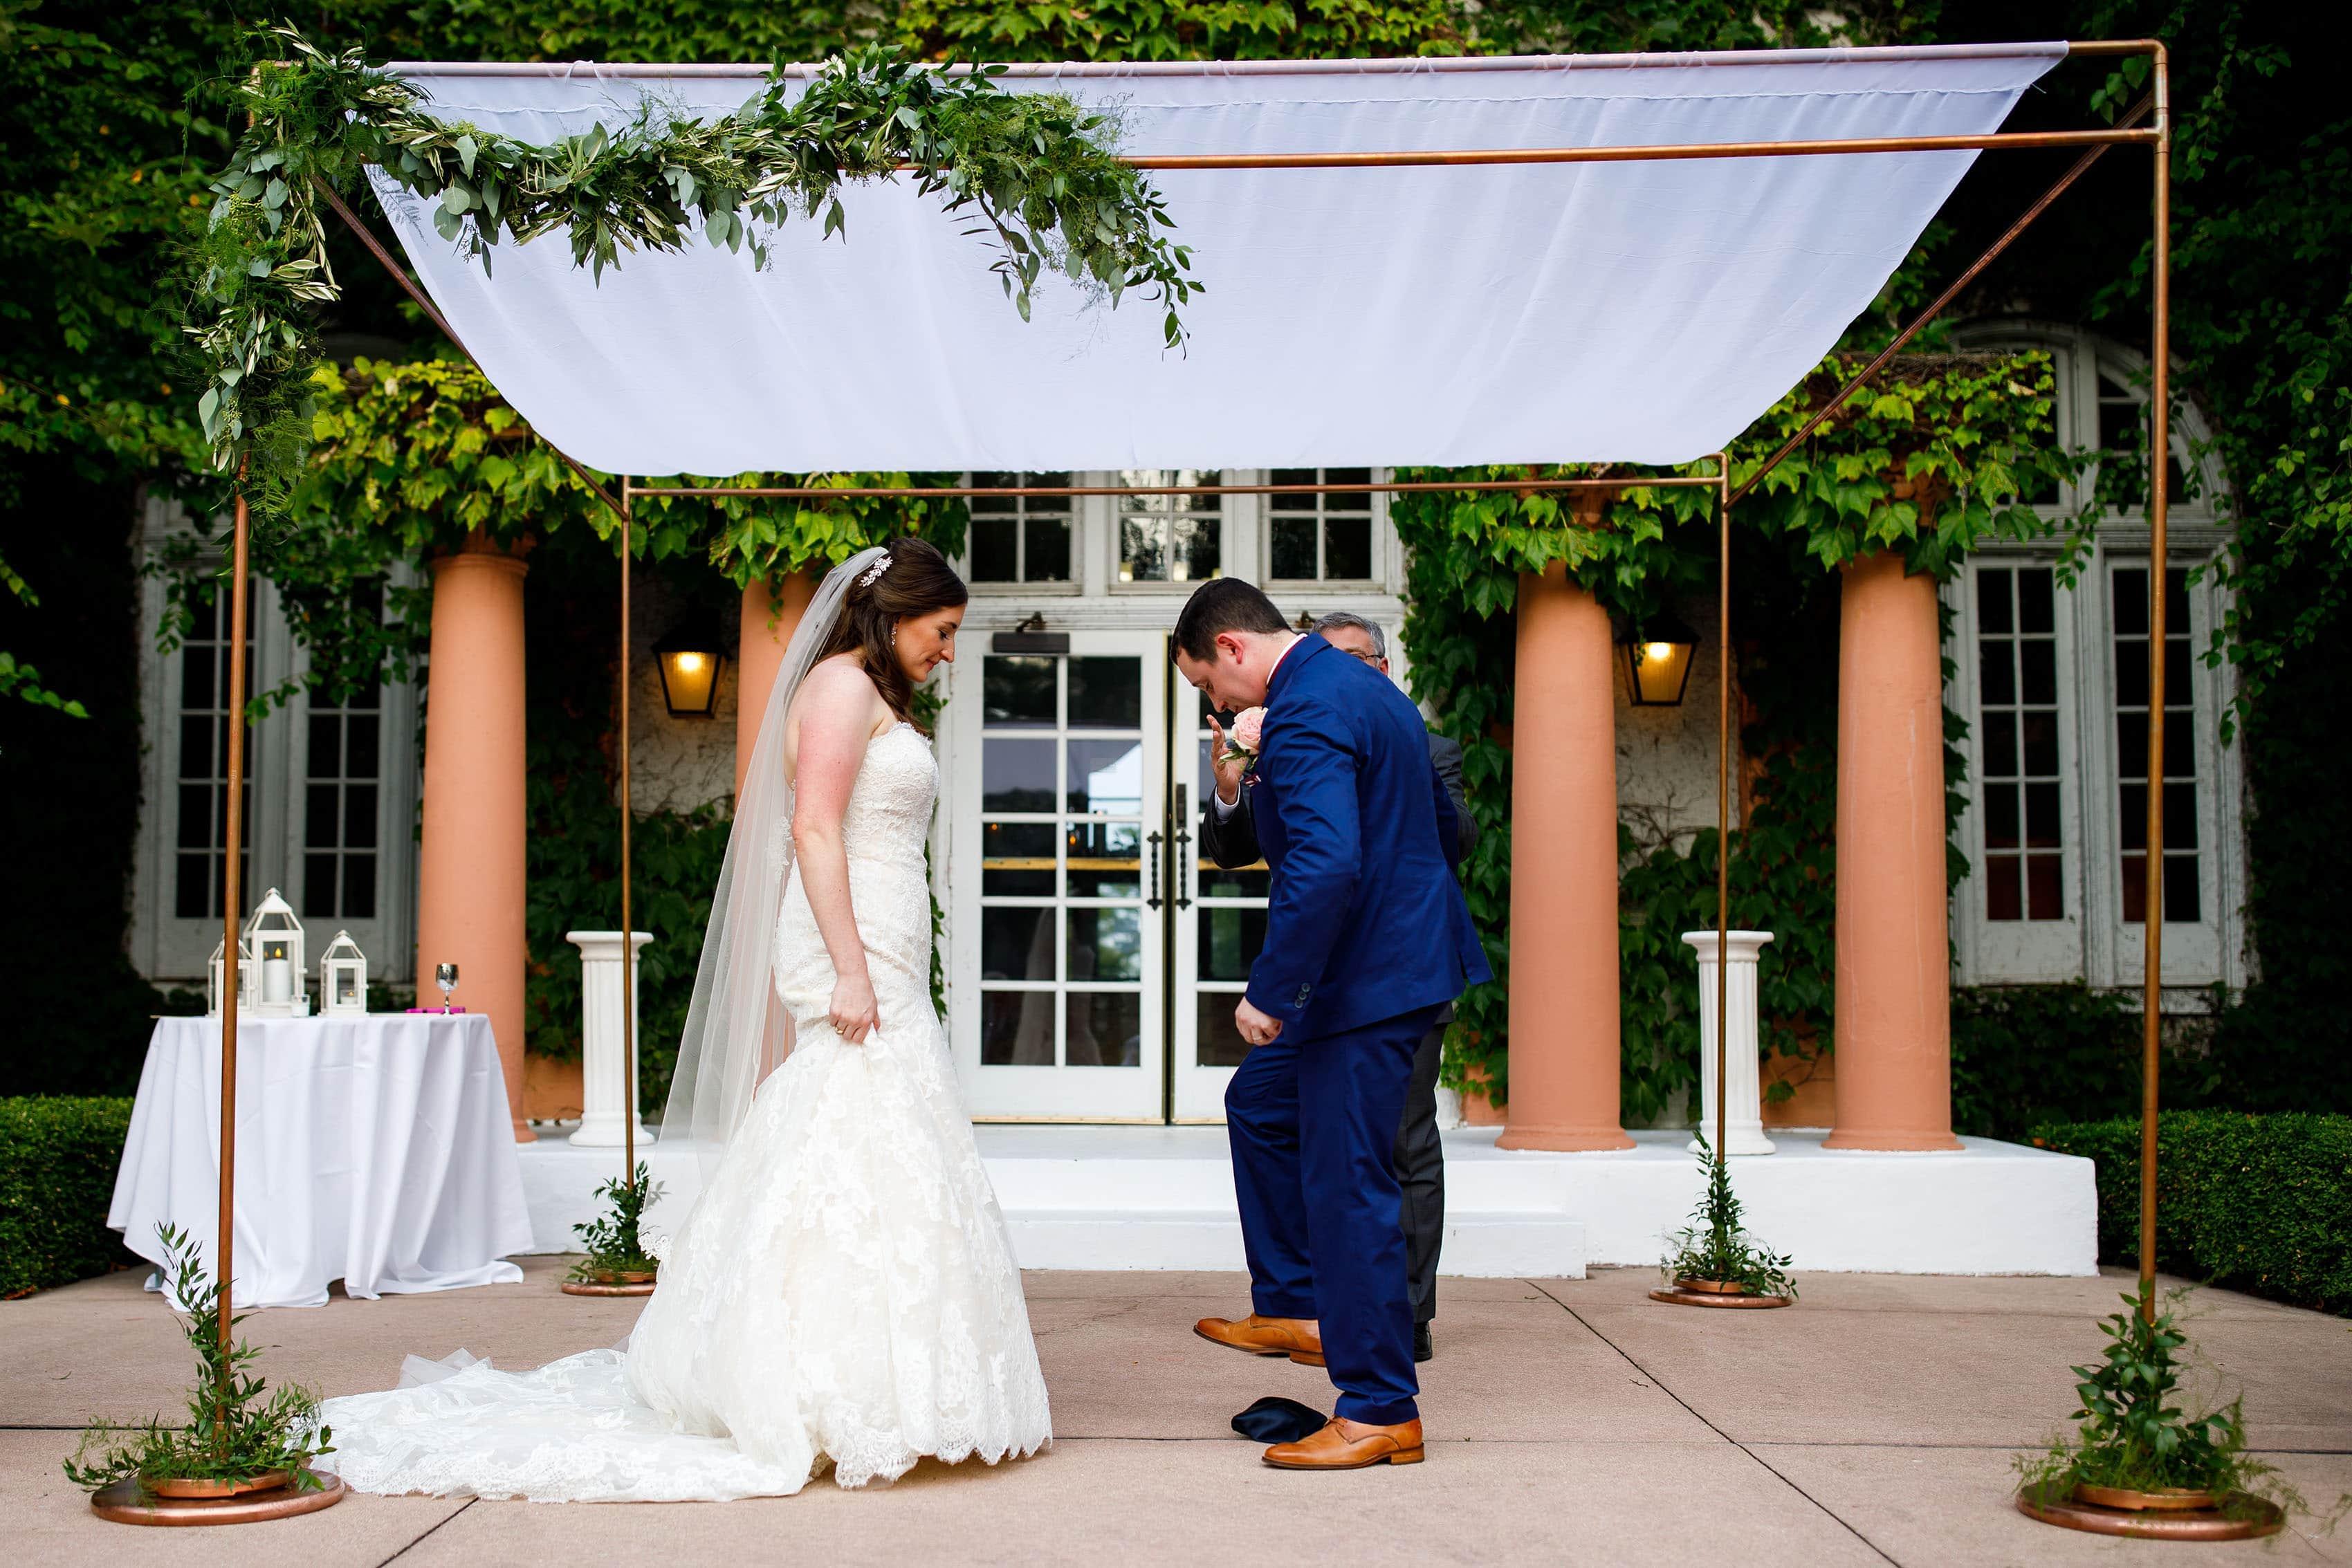 Joel breaks a glass under the chuppah during their Ravisloe Country Club wedding